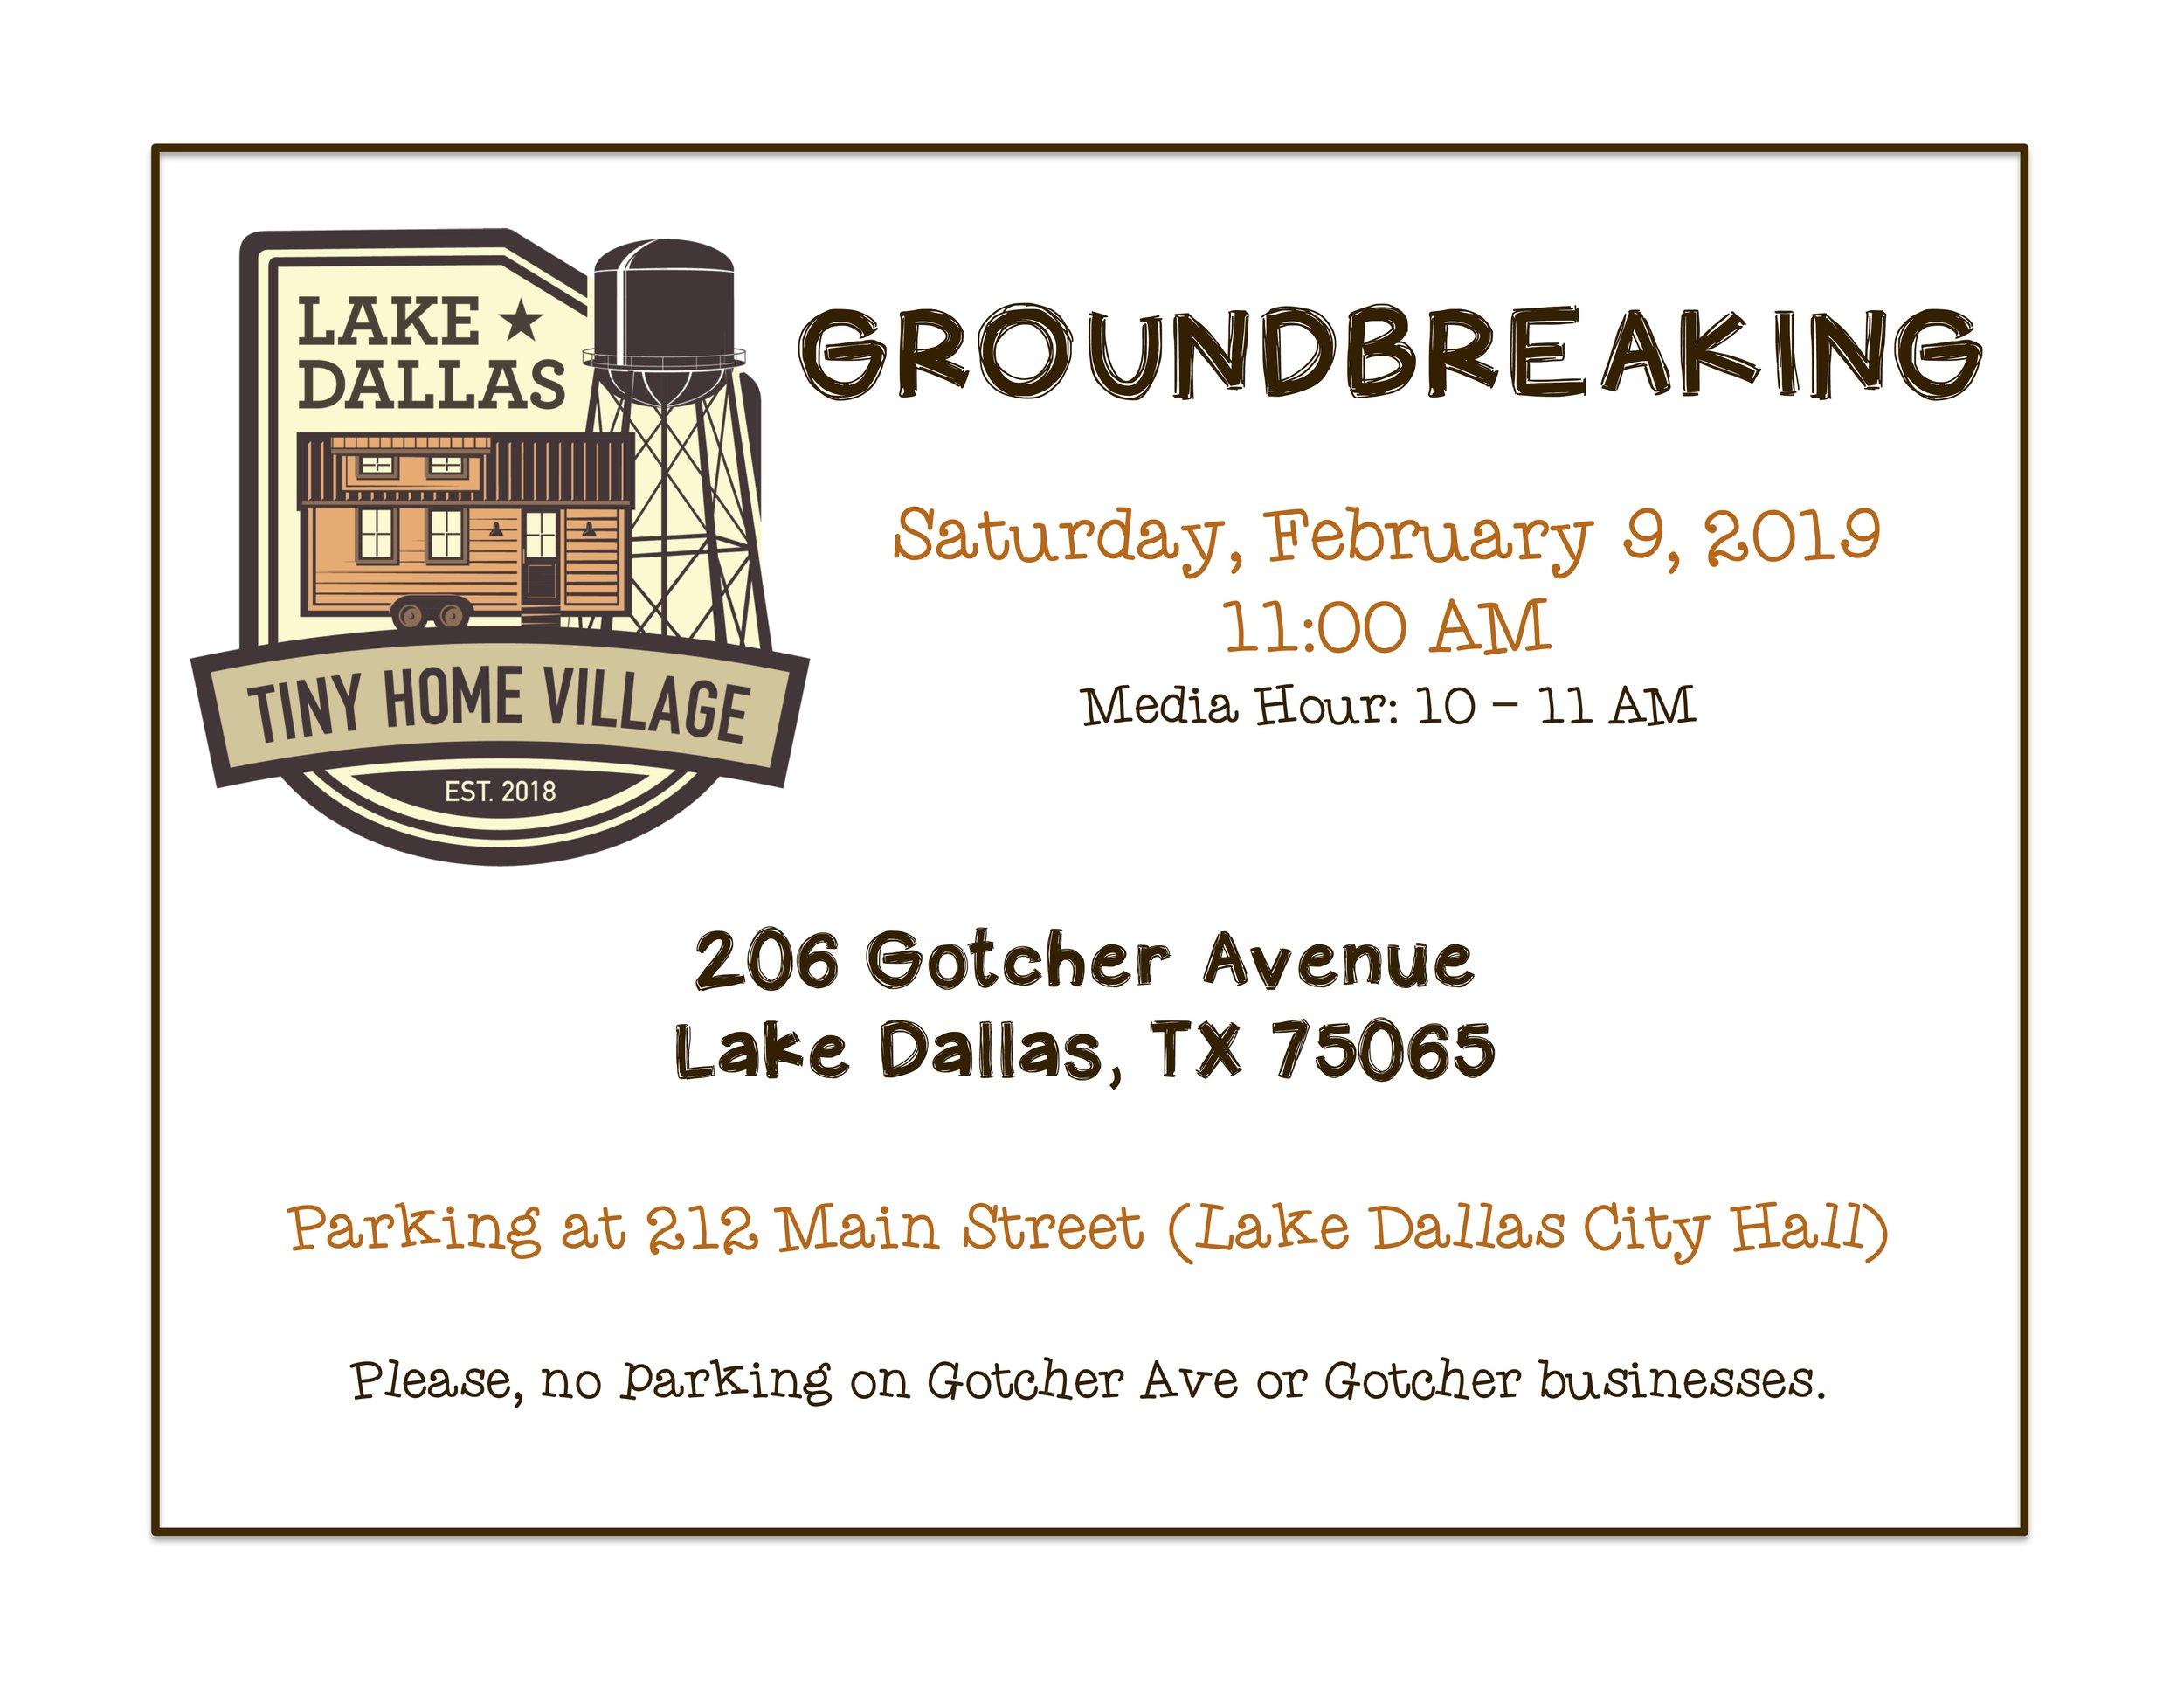 LD Tiny Home Groundbreaking flyer.jpg